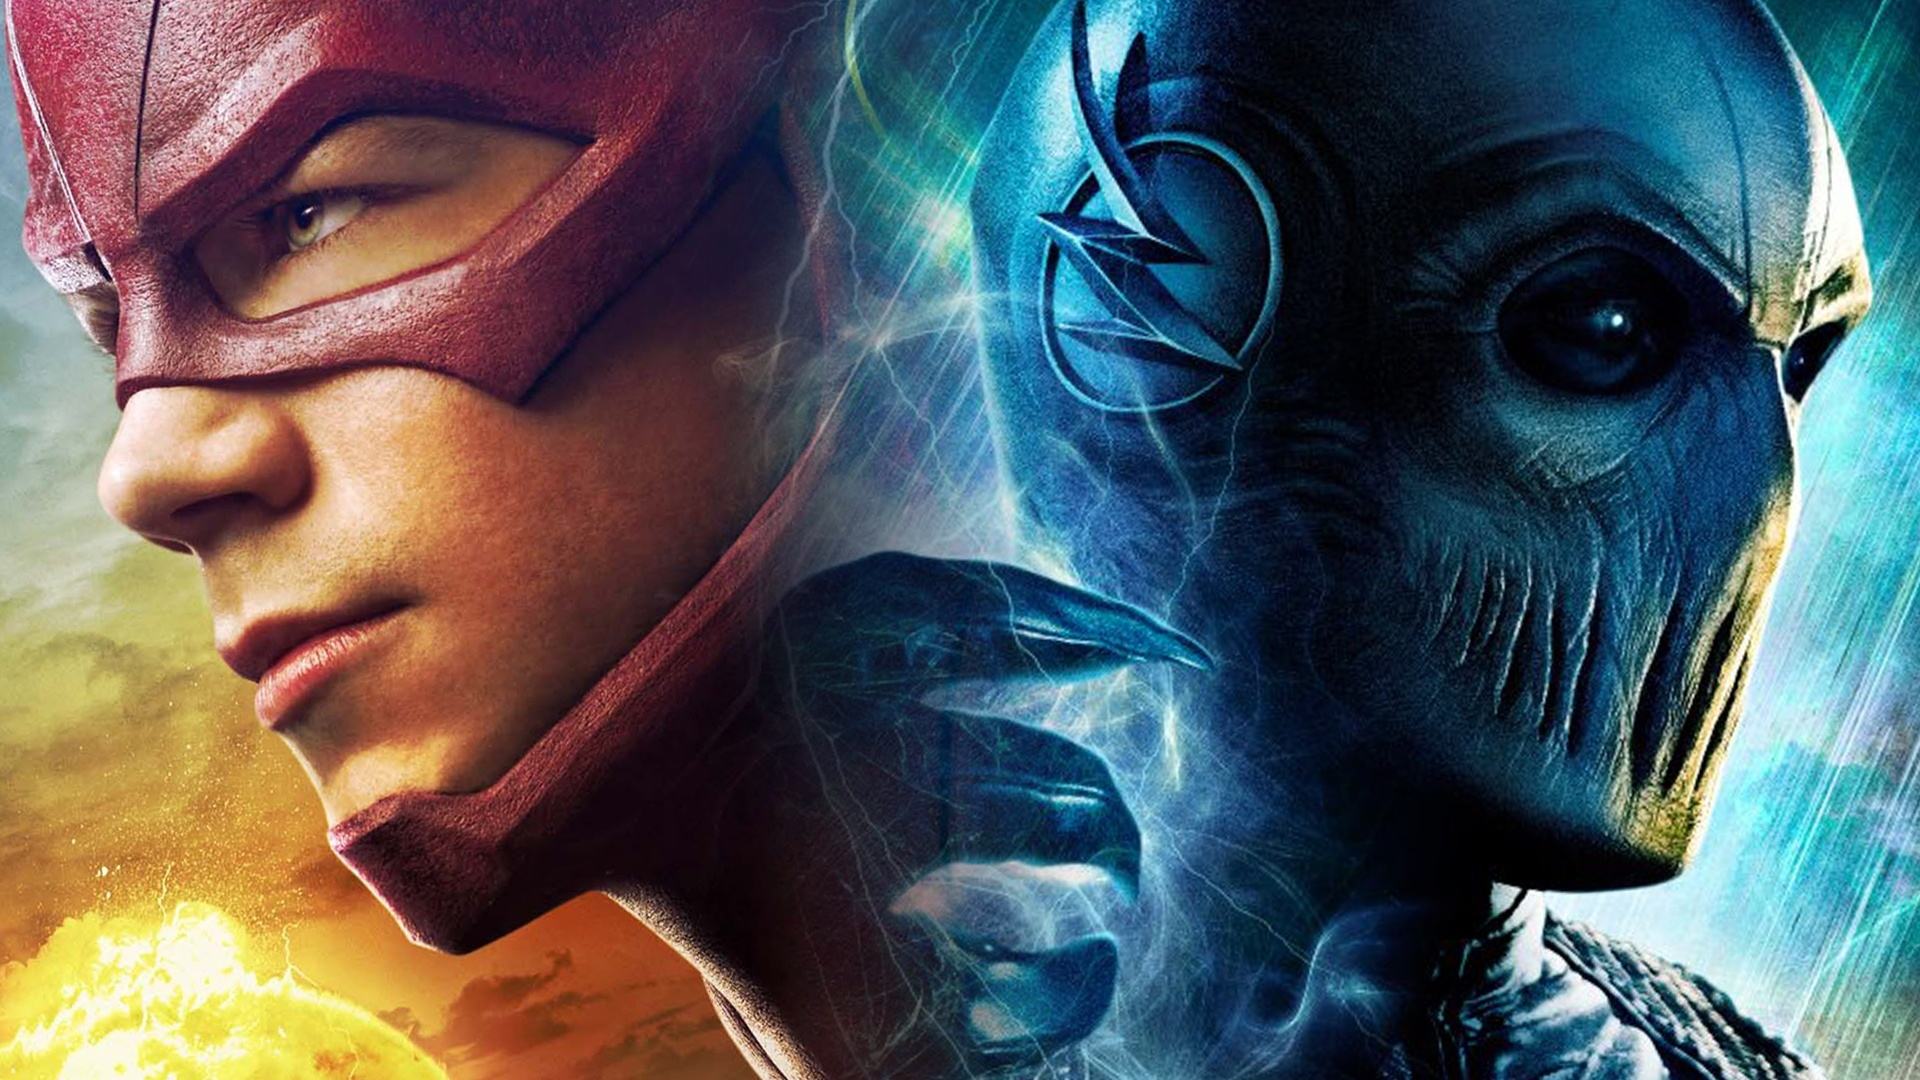 The Flash pc wallpaper